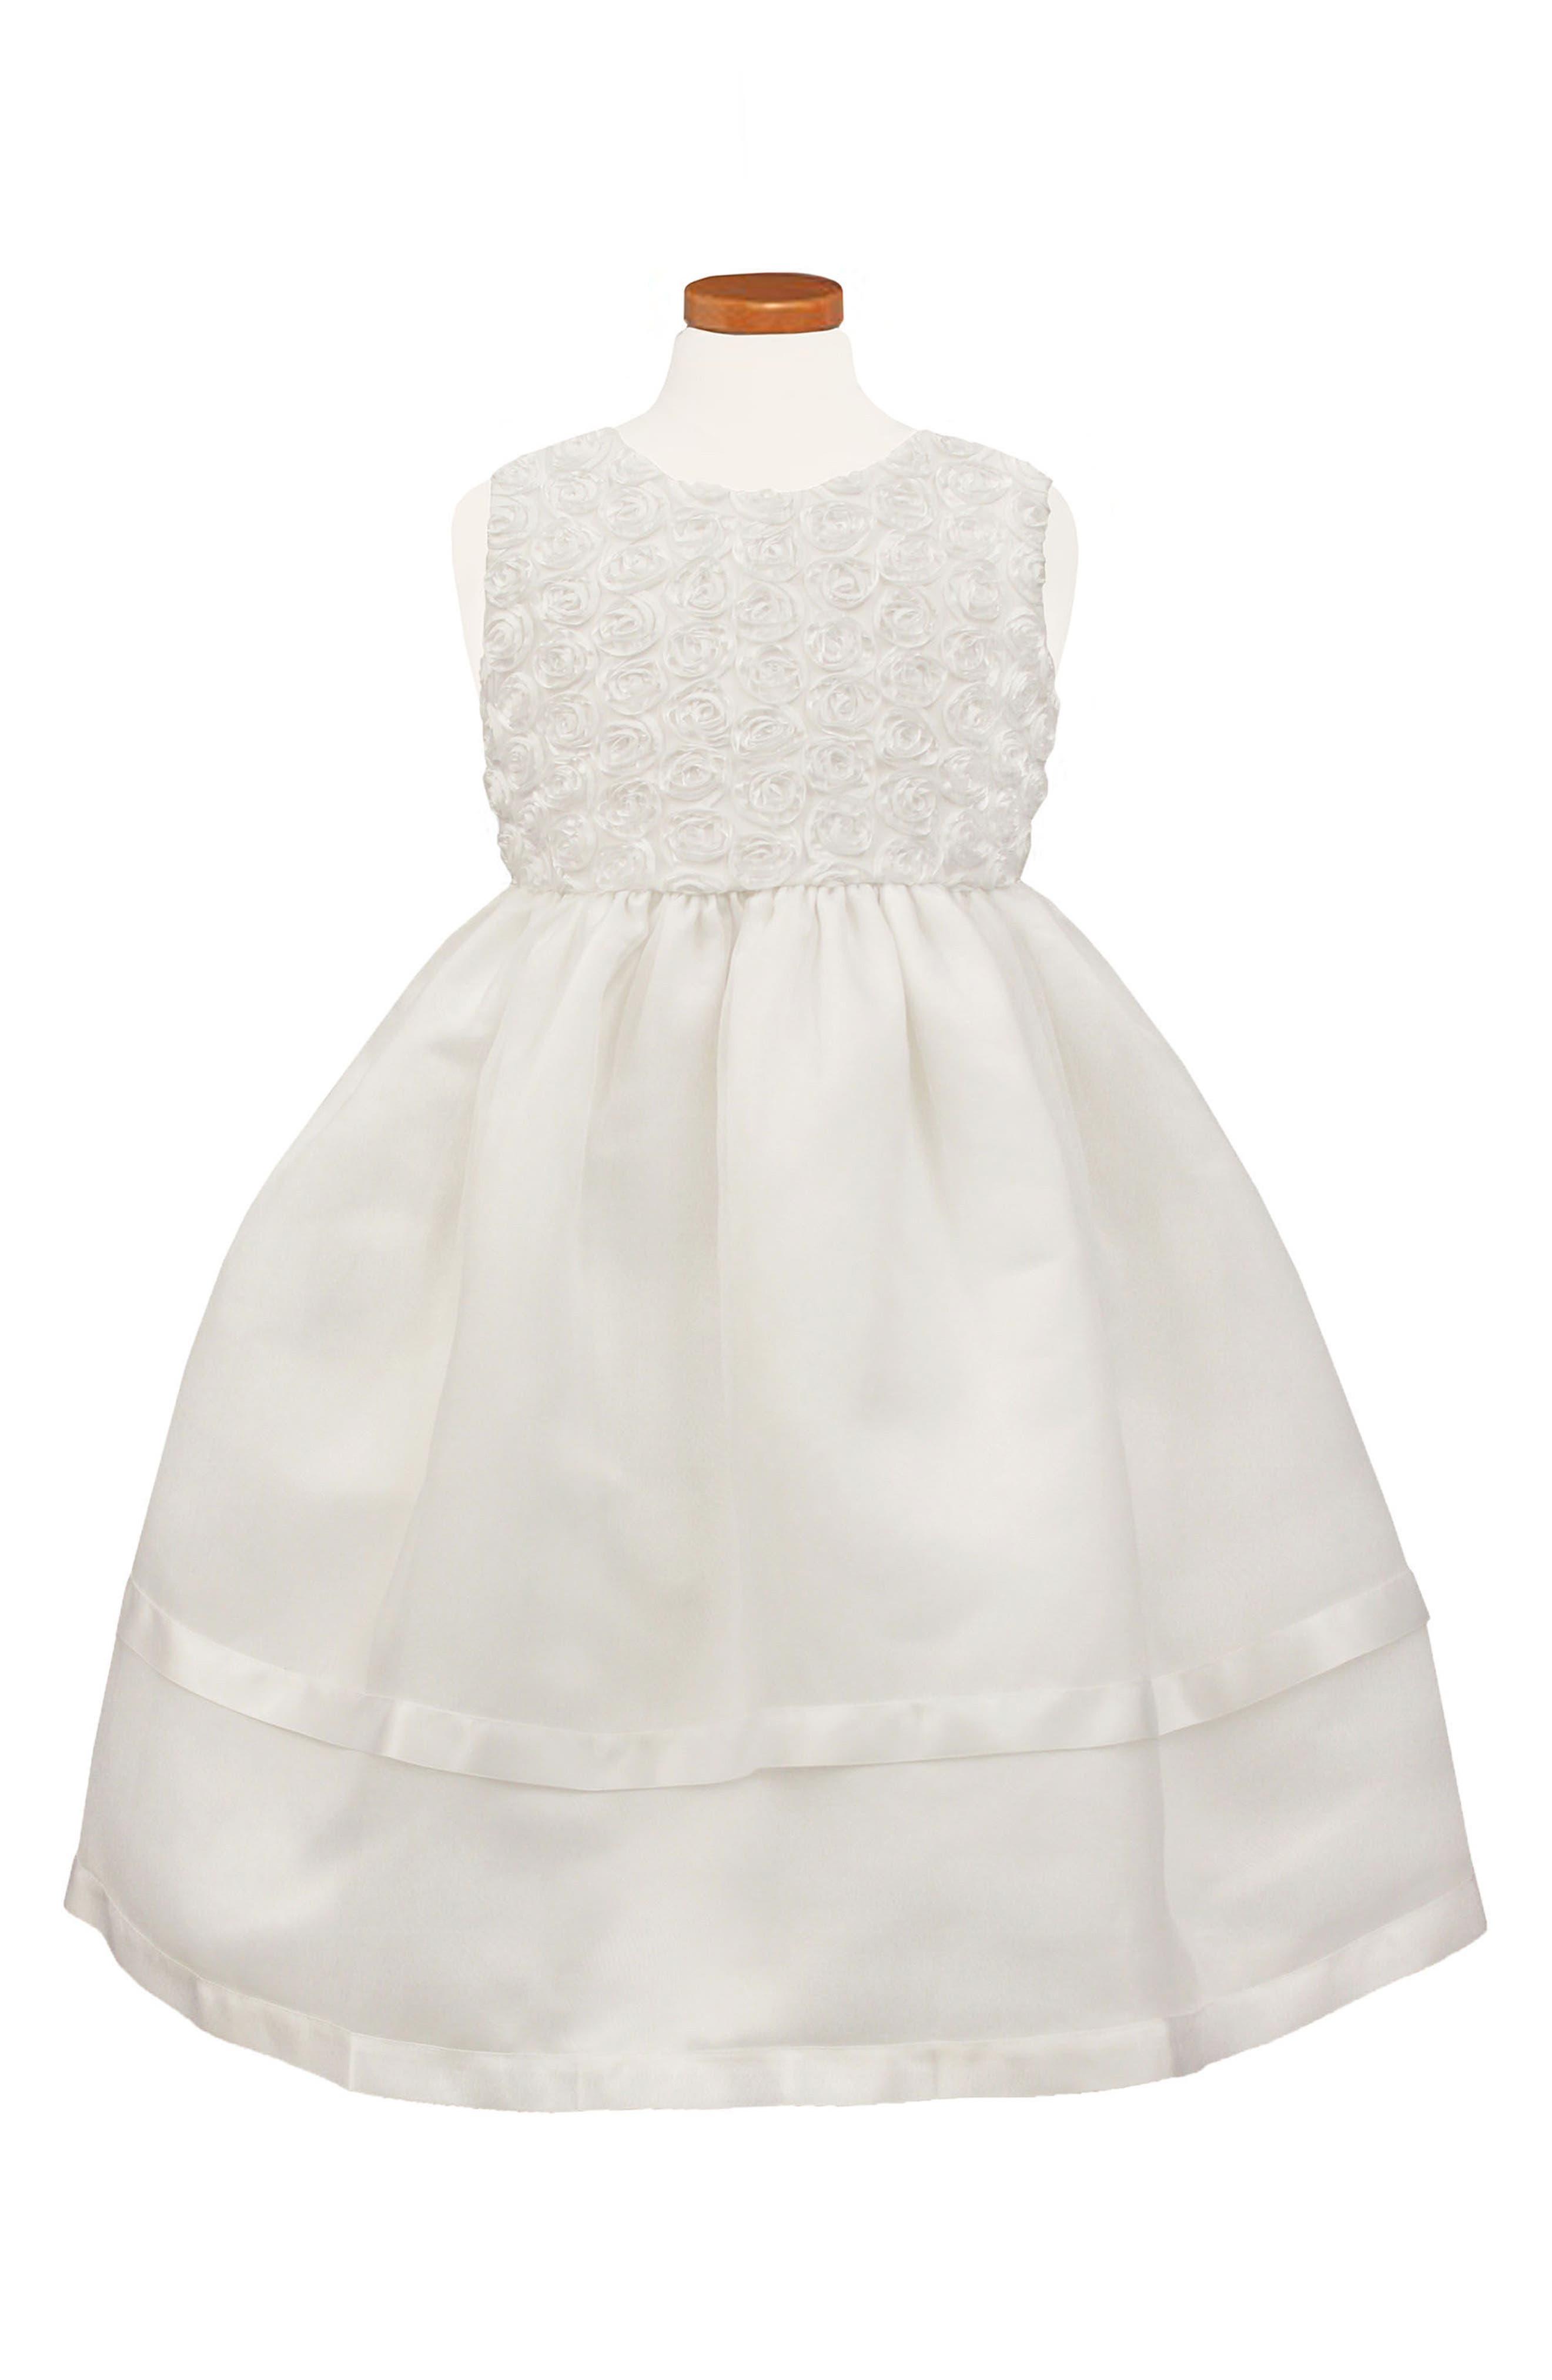 Alternate Image 1 Selected - Sorbet Sleeveless Organza Dress (Toddler Girls & Little Girls)